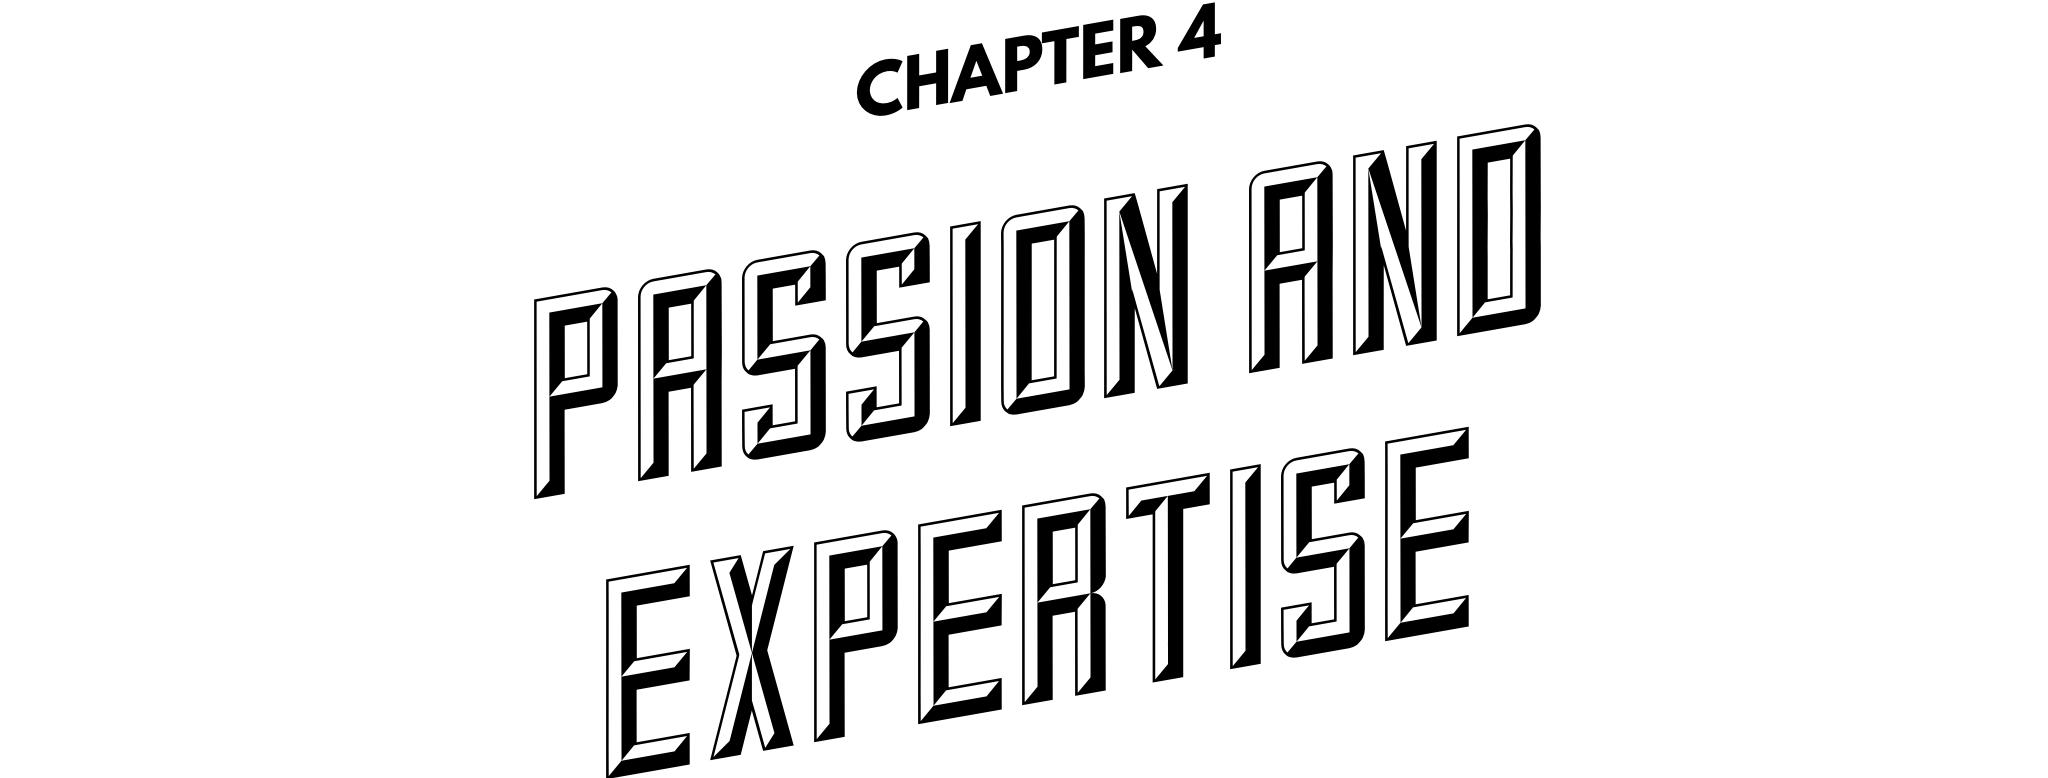 Chapter 4 header.PNG